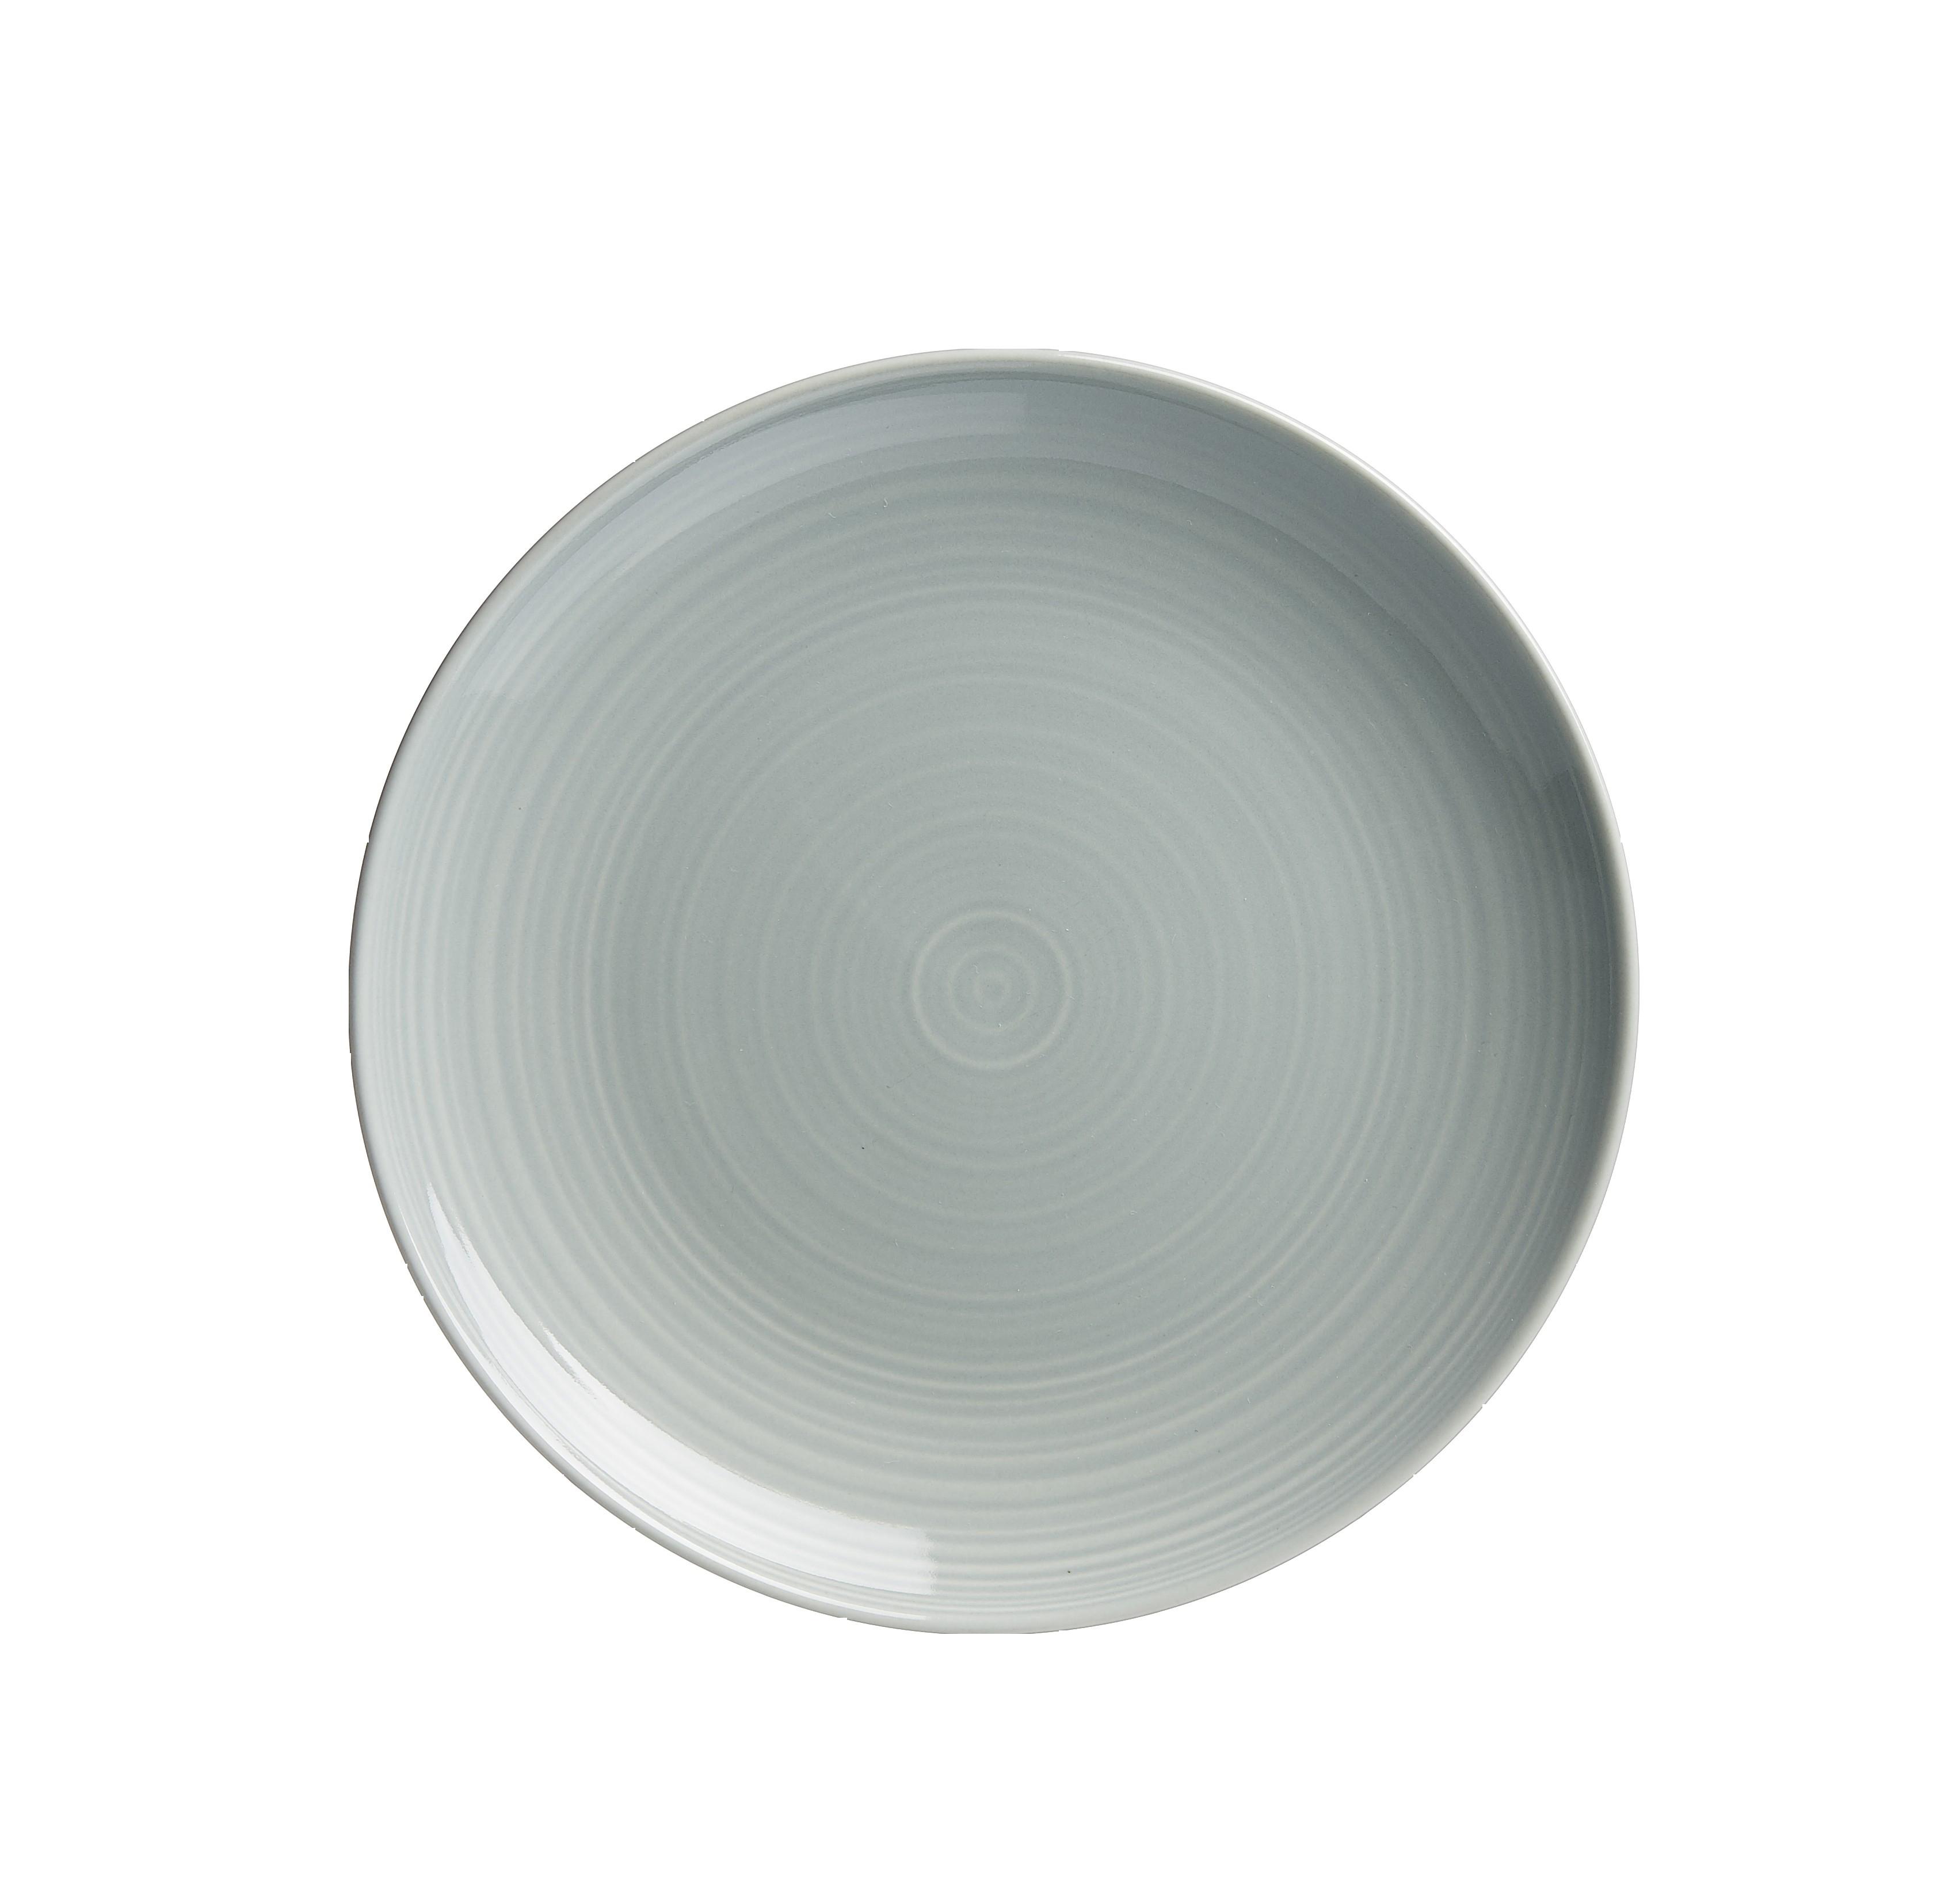 TELLER 20 CM        GRAU-BLAU SUOMI Standard